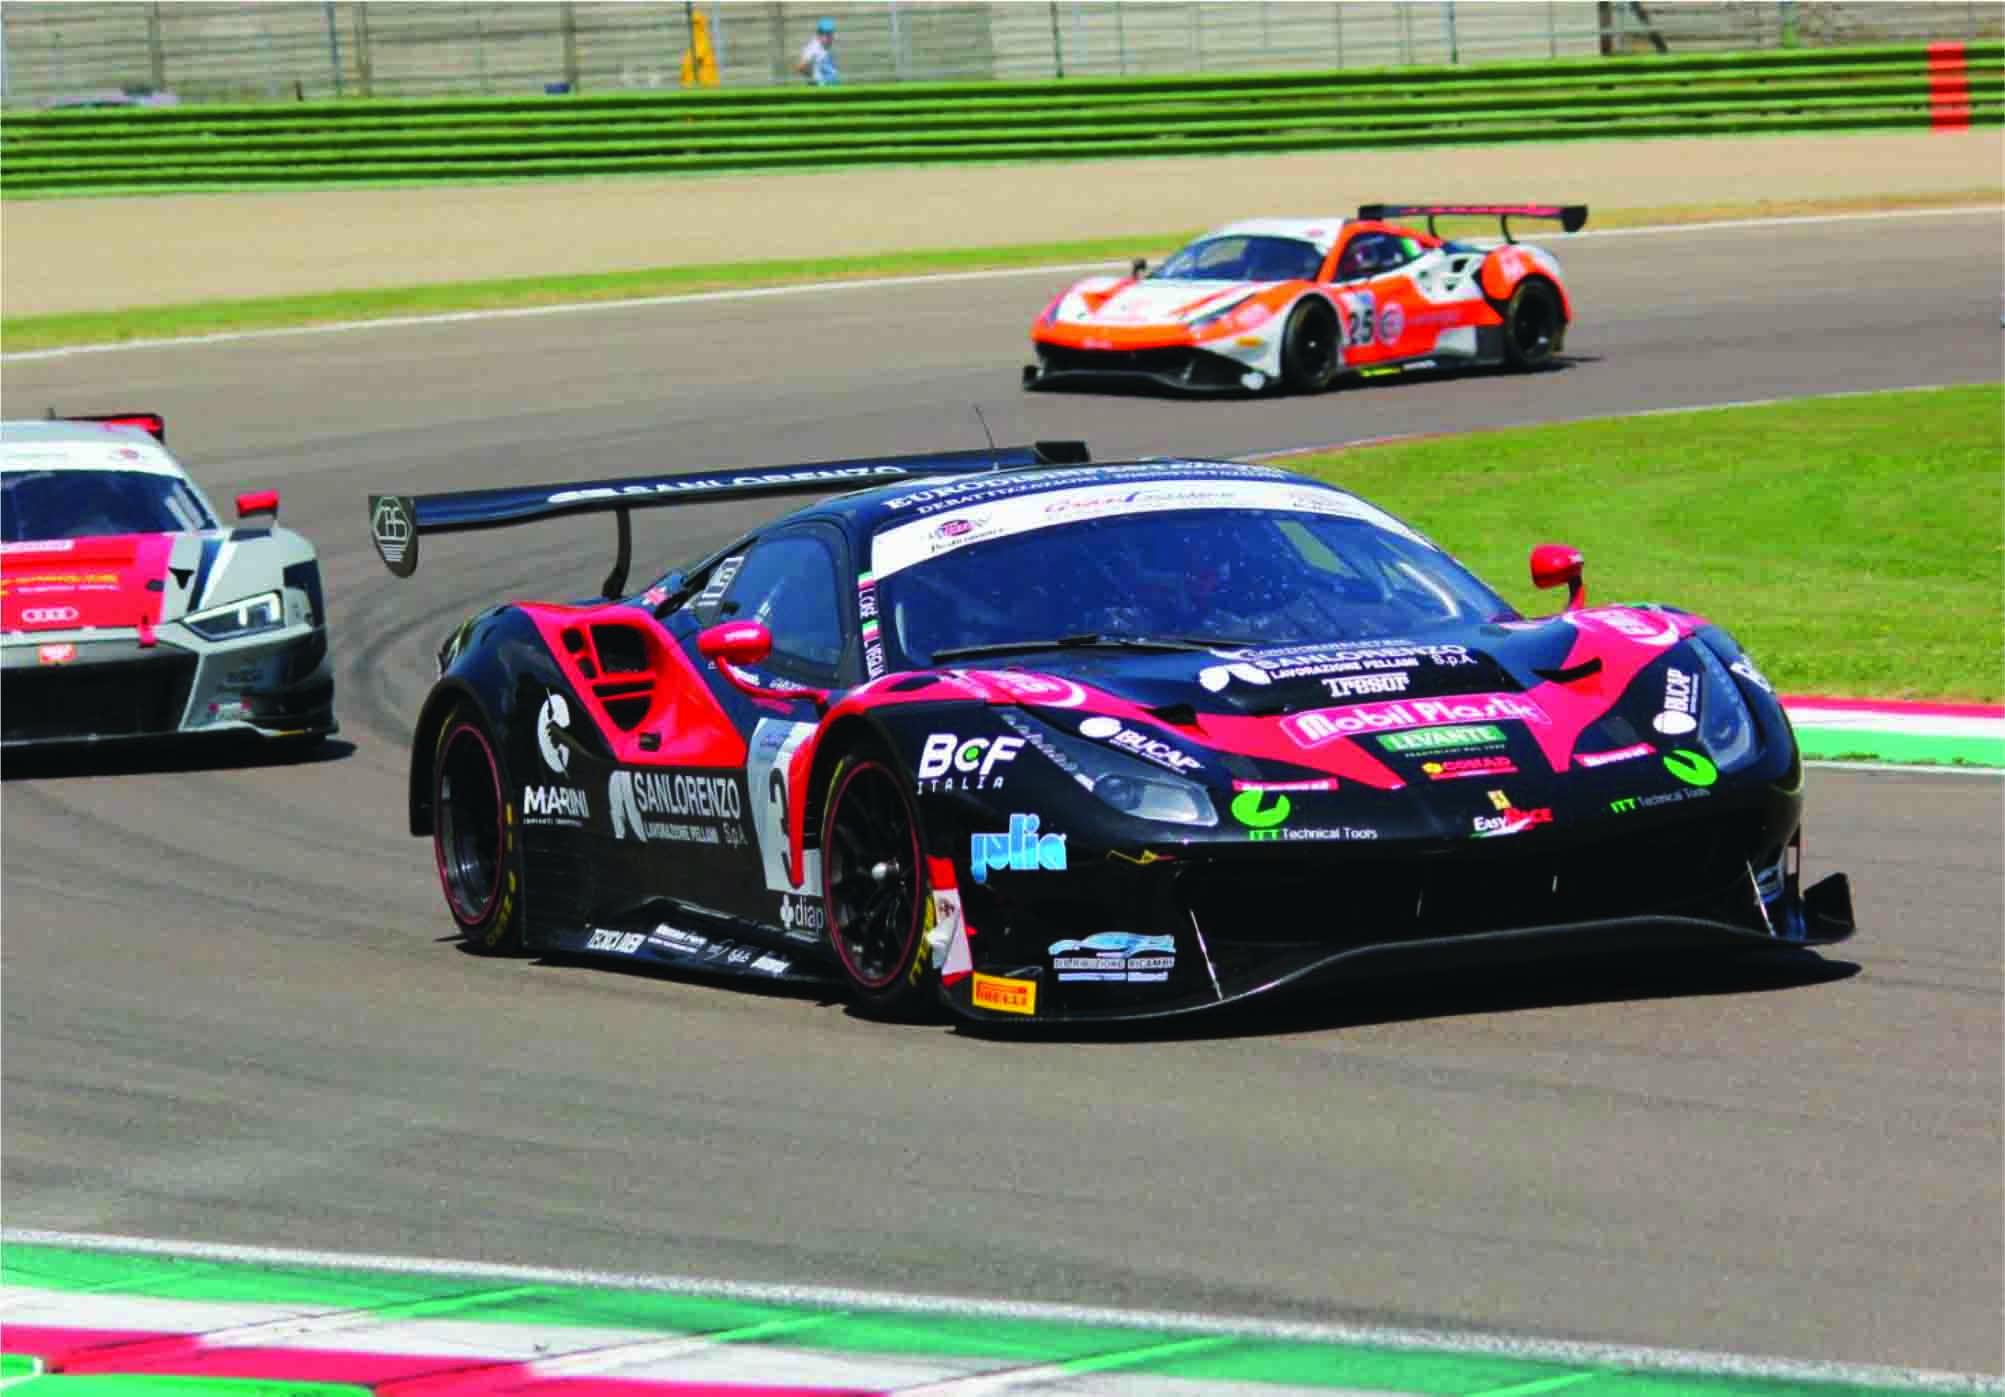 Third Place At Imola For The Easyrace Ferrari Julia Utensili